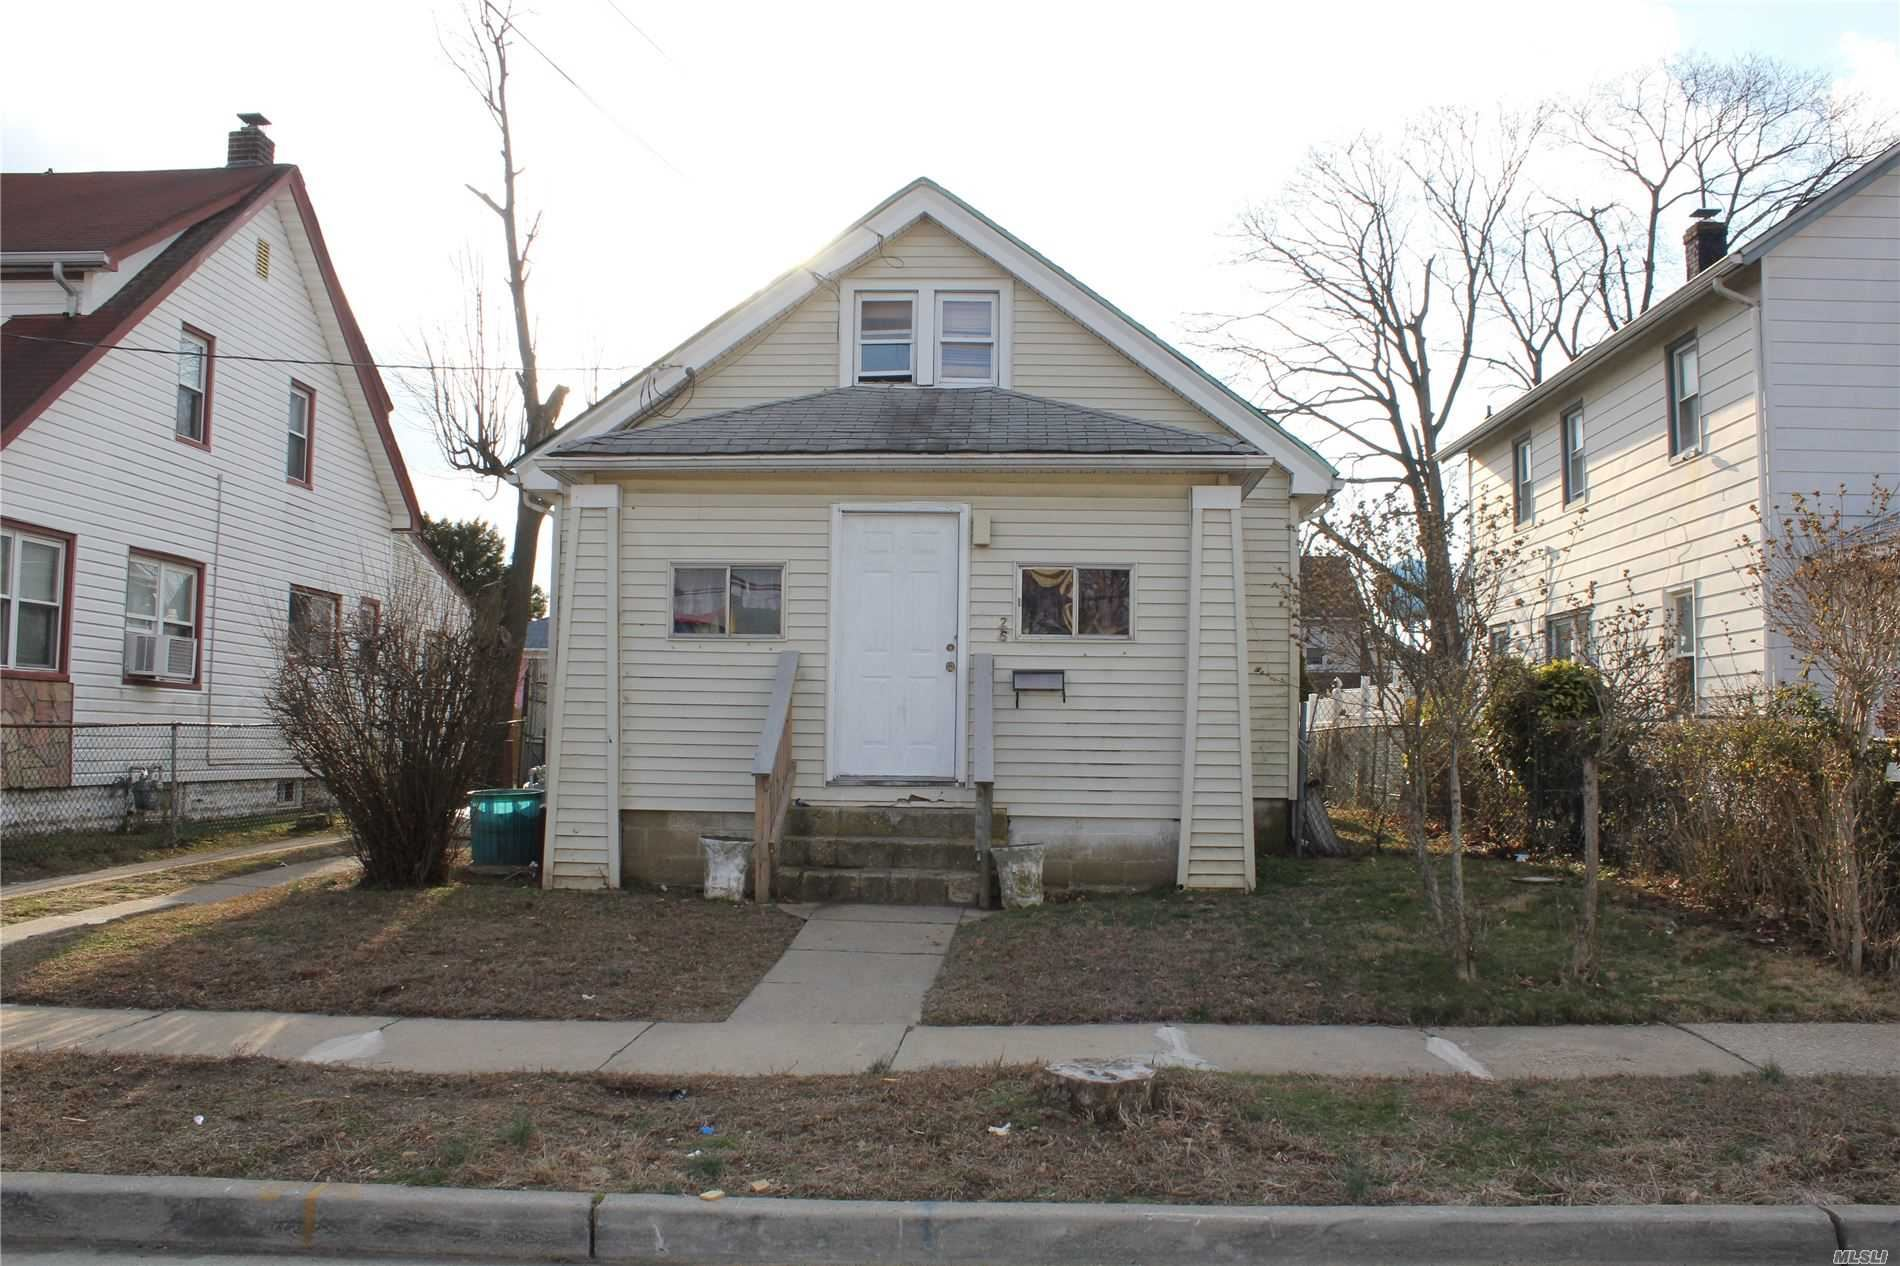 26 Garfield Place, Hempstead, NY 11550 - MLS#: 3204677